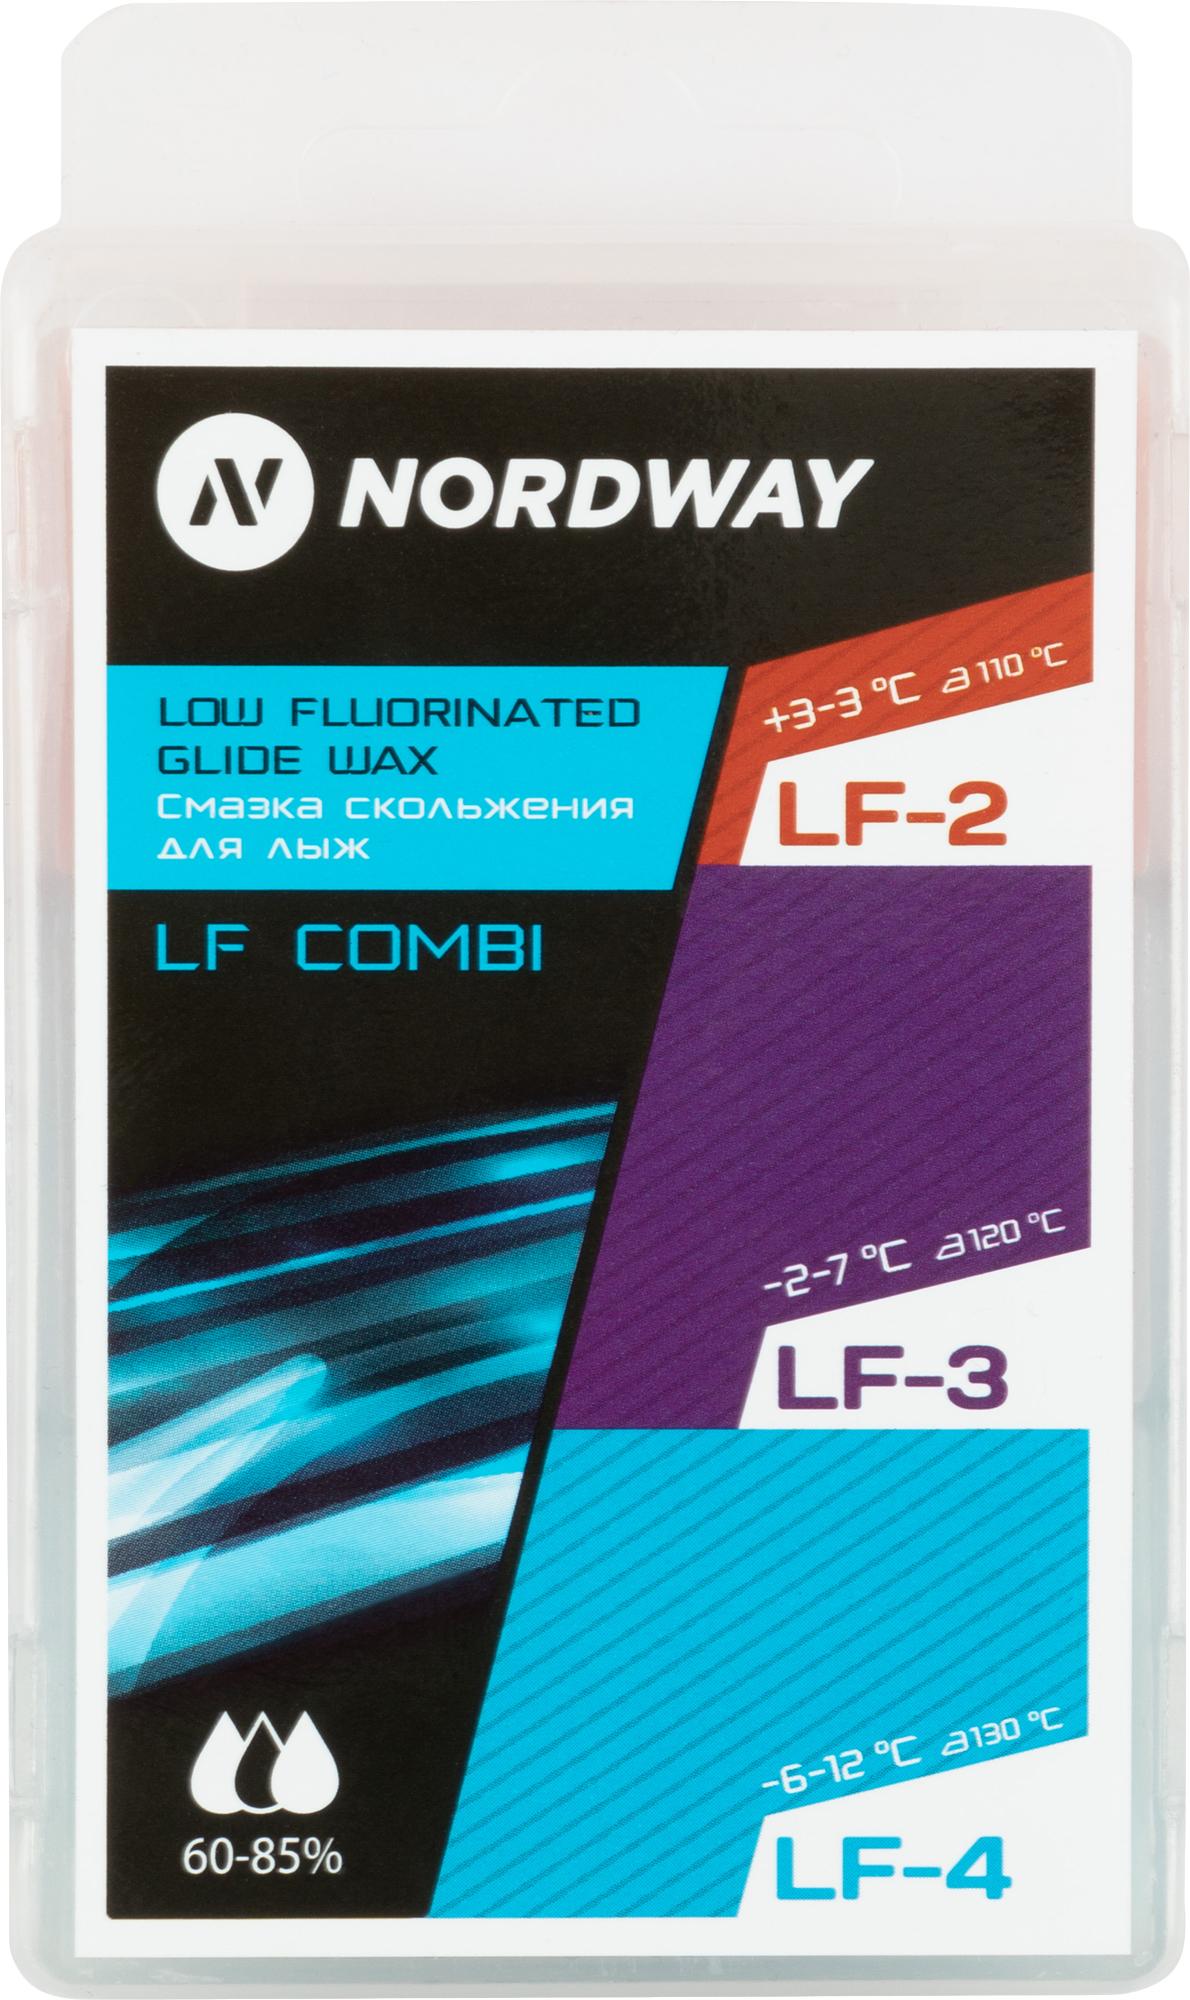 Nordway Набор лыжный: мазь для лыж Nordway, 3 шт.